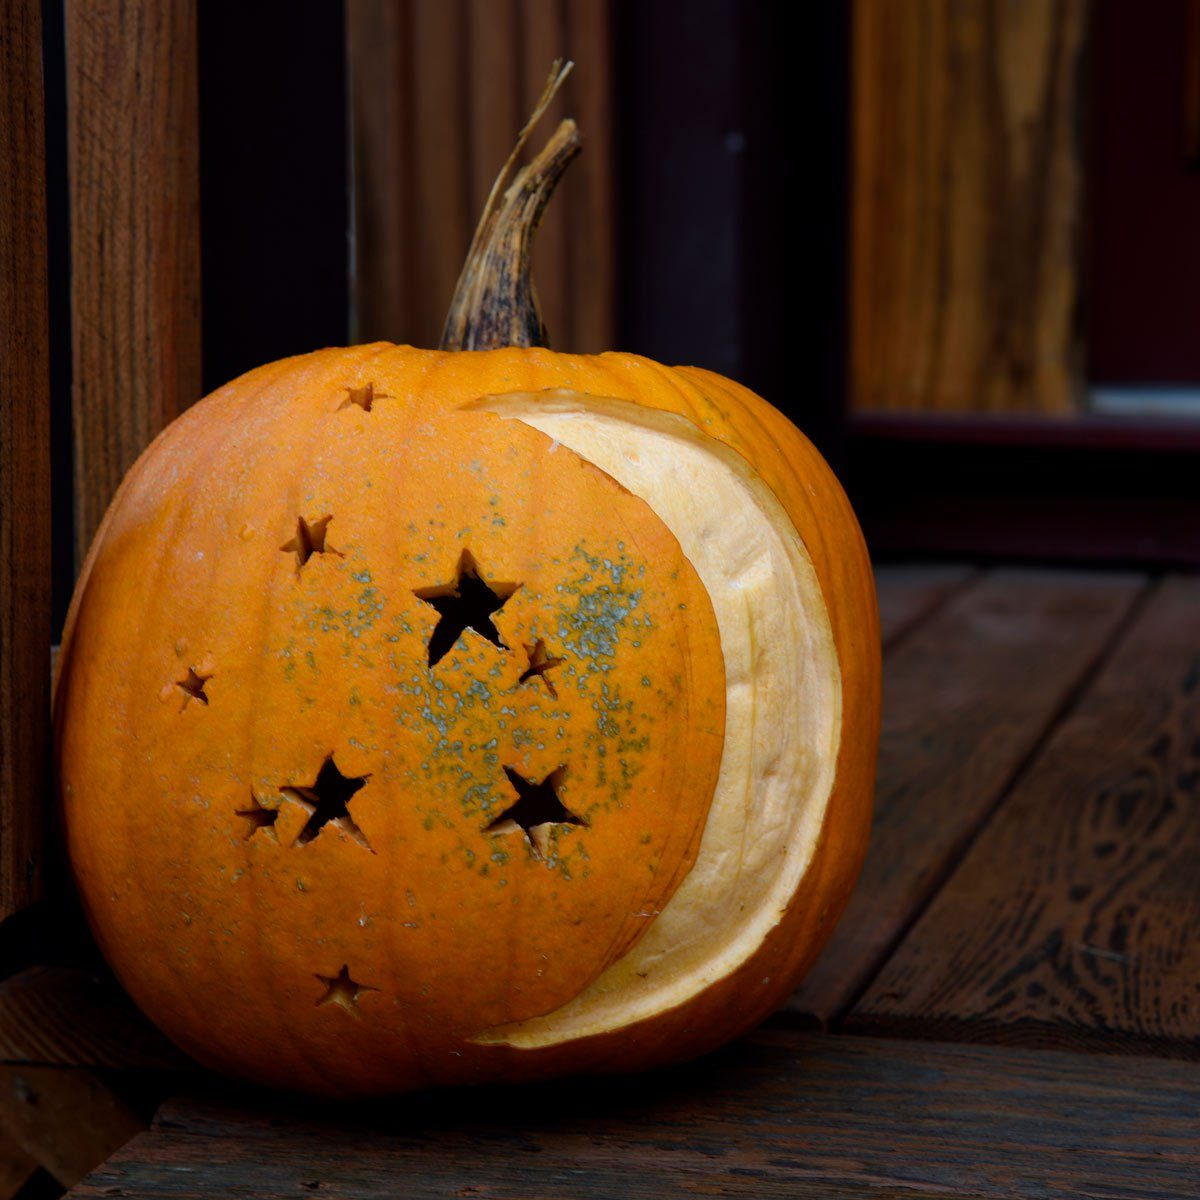 Night sky on pumpkin